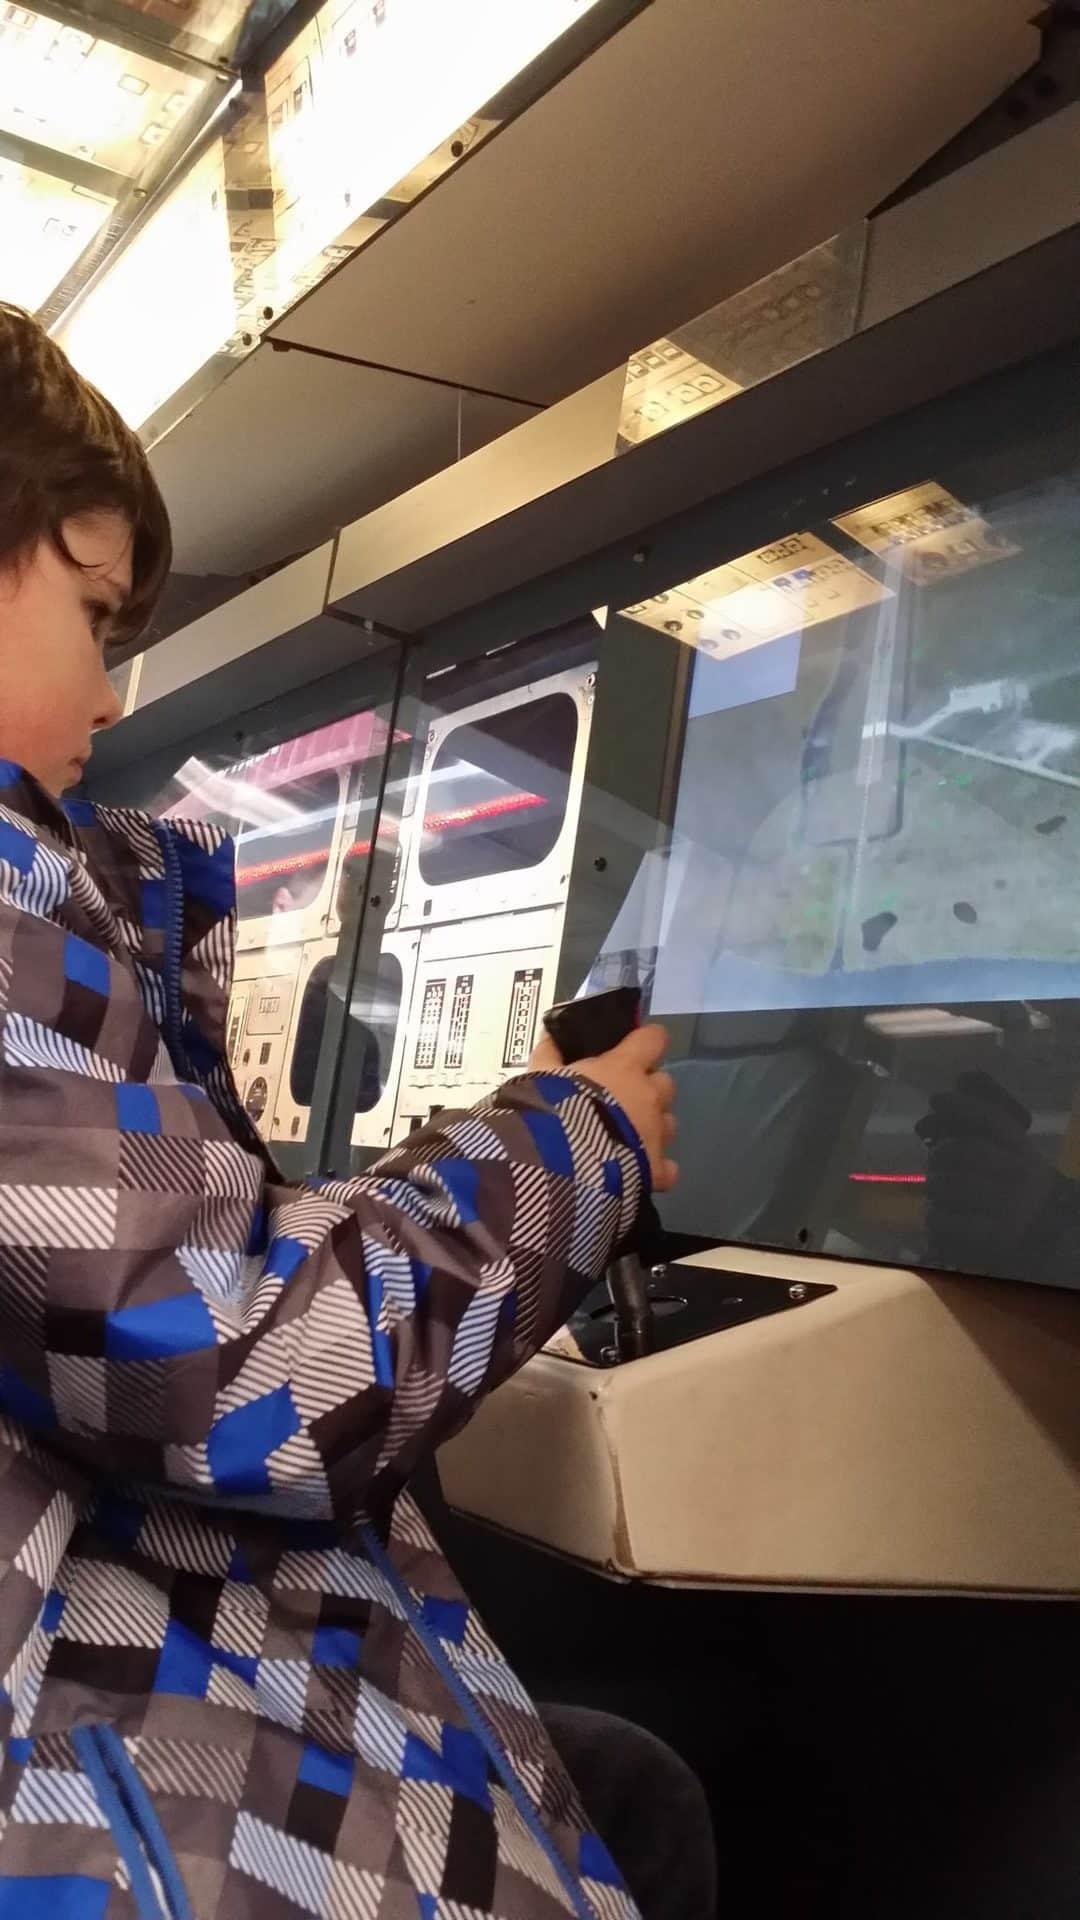 US Space and Rocket Center - flight simulator